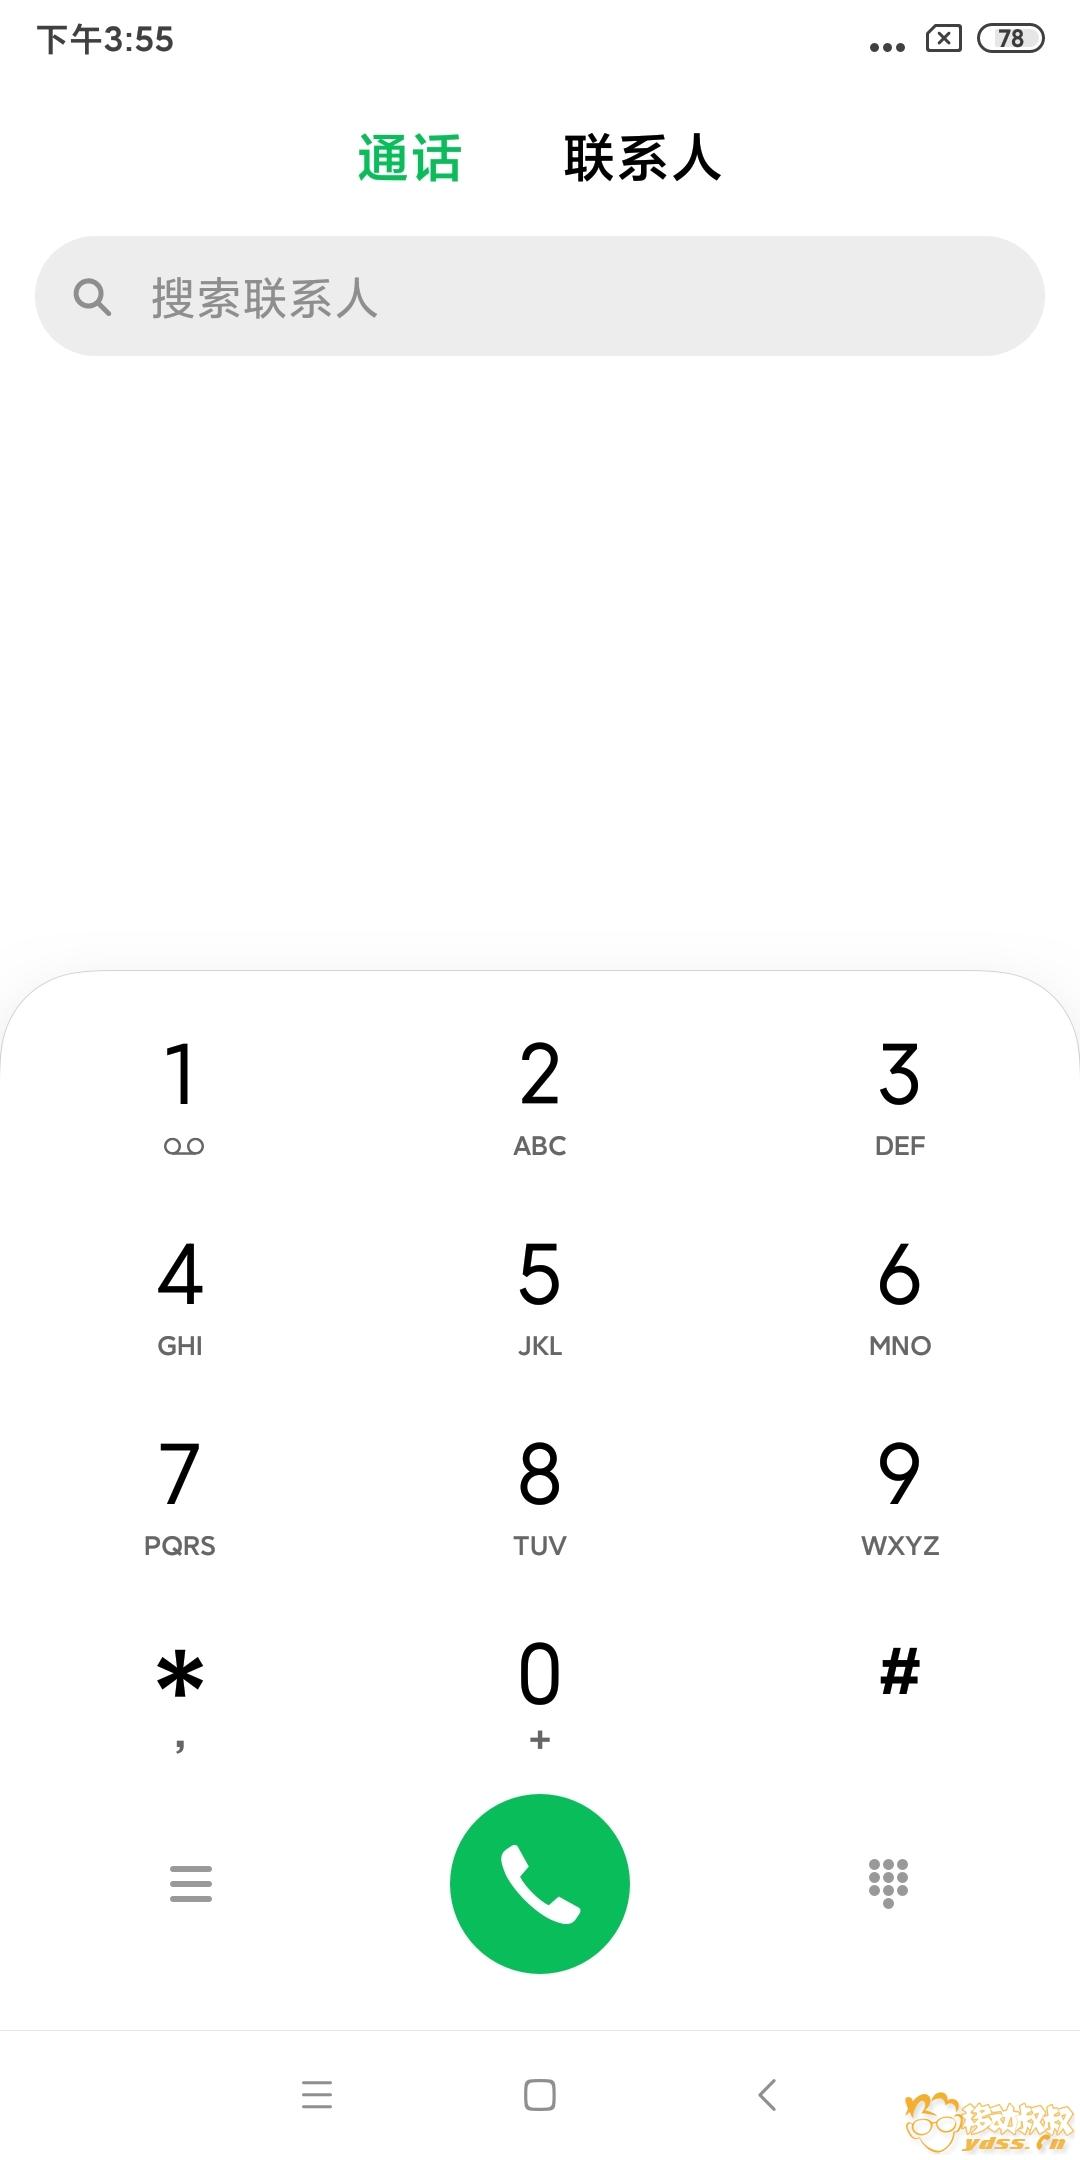 Screenshot_2019-11-12-15-55-27-525_com.android.contacts.jpg